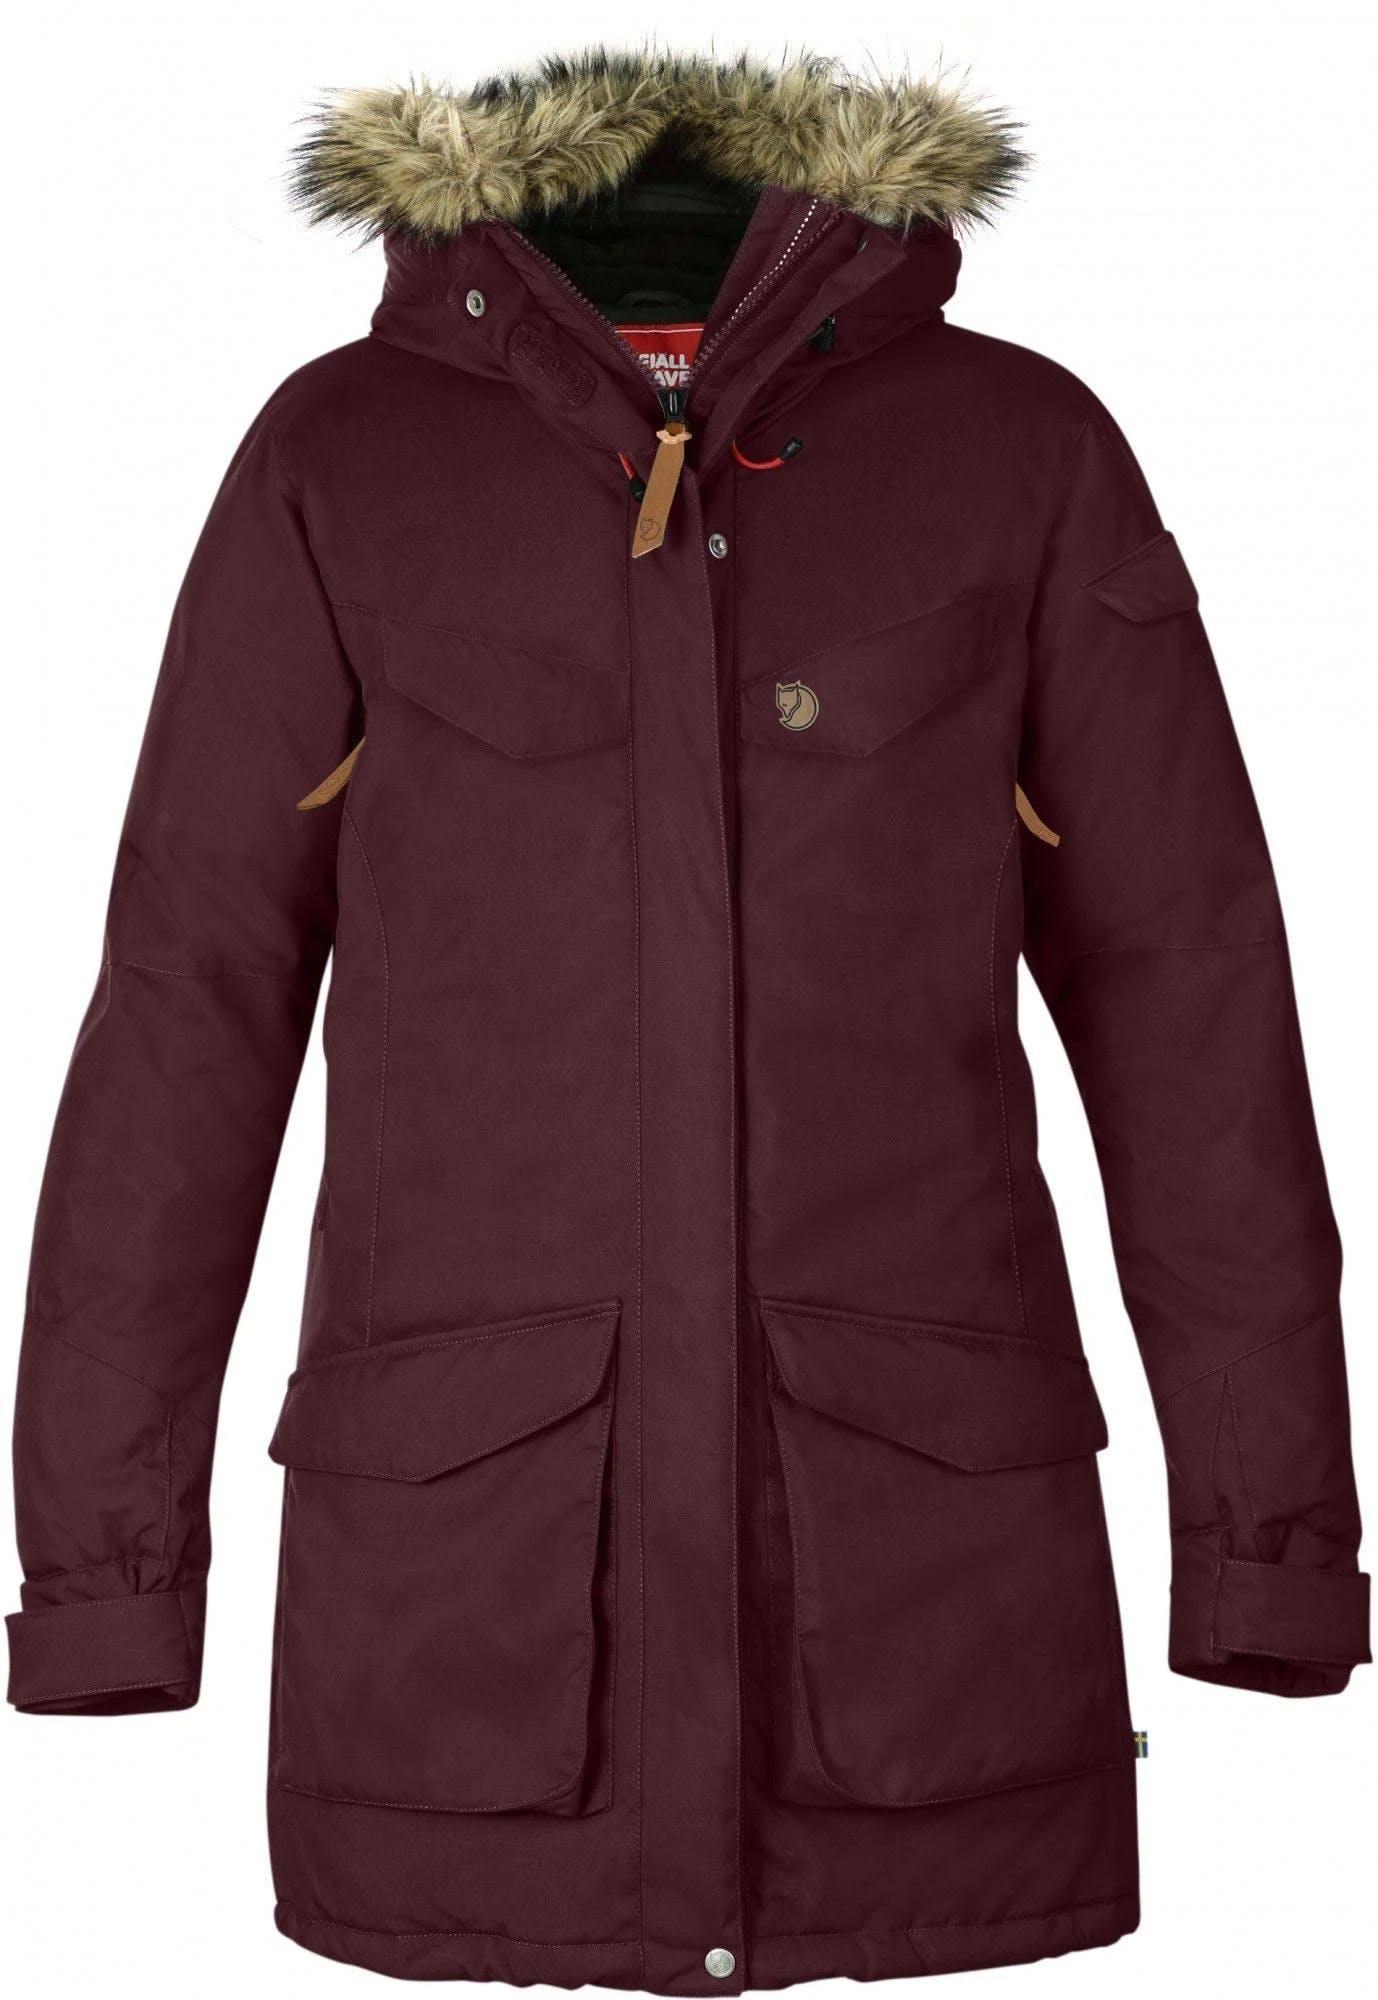 Fjallraven Women's Nuuk Parka Dark Garnet L Jacket